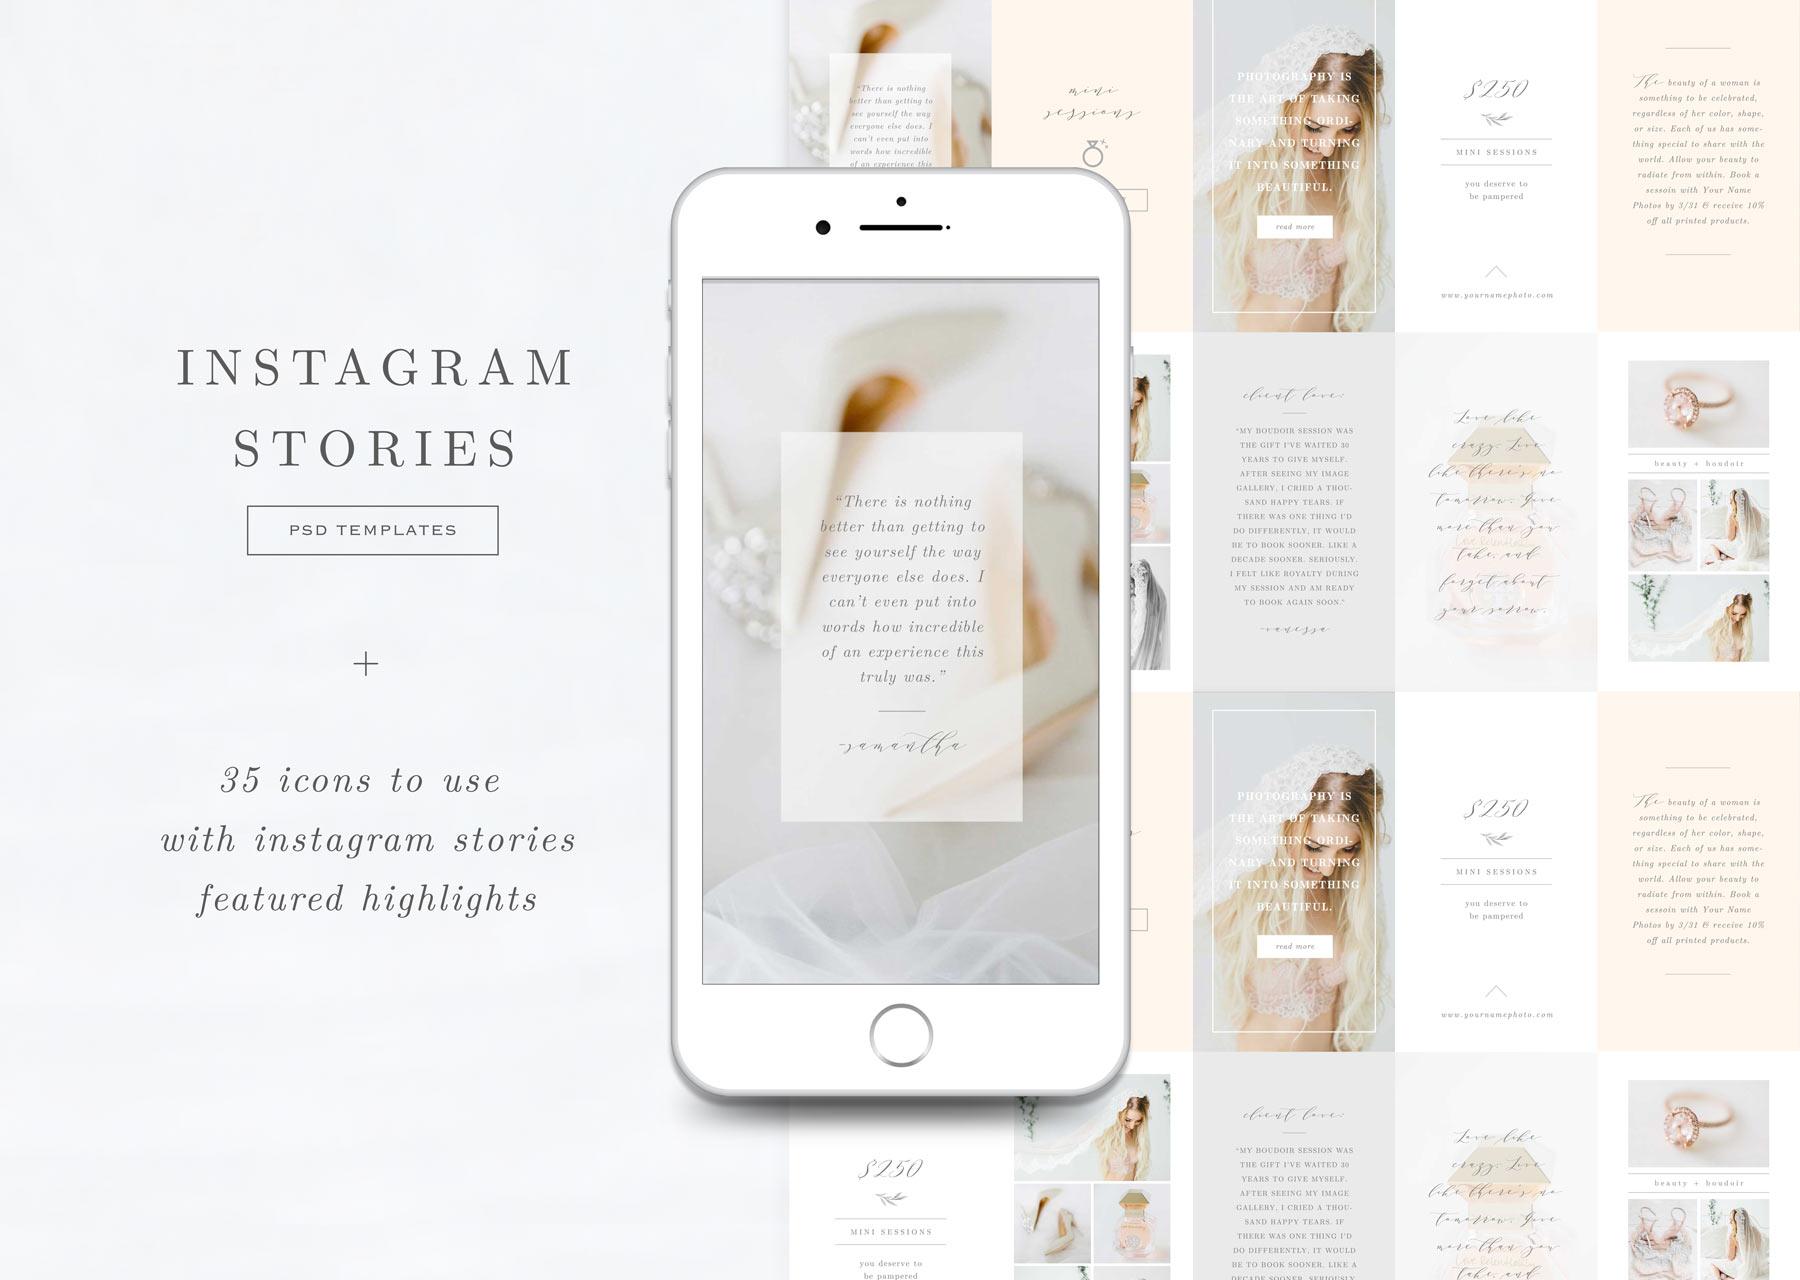 instagram-stories-icons.jpg